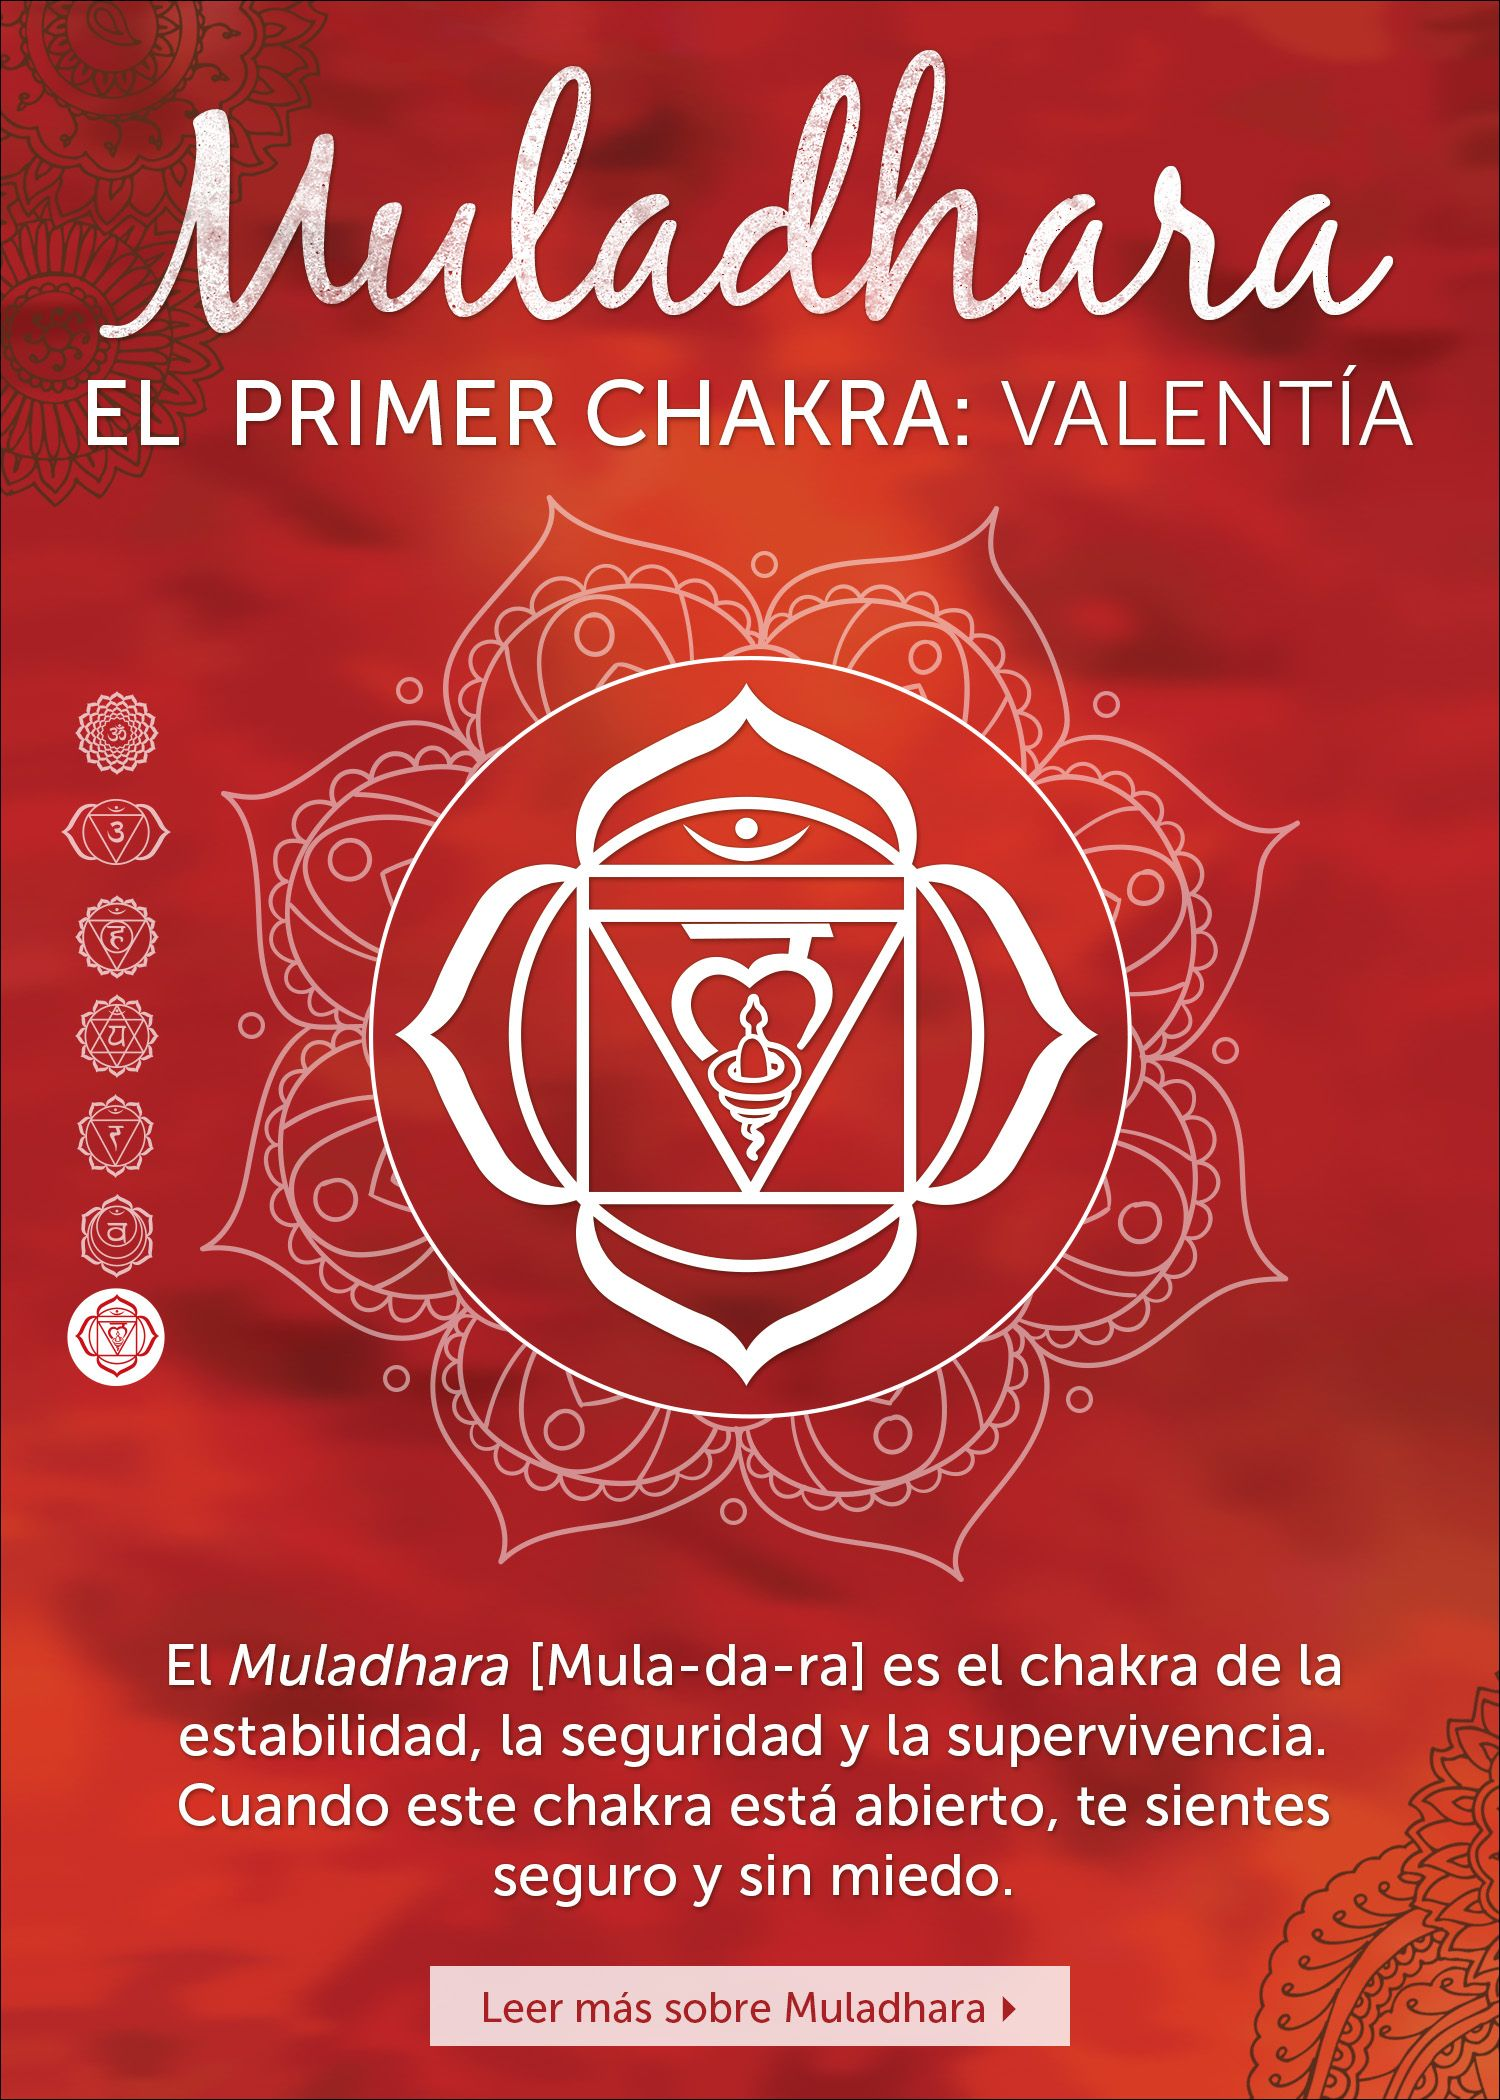 1st Chakra, Chopra meditation #chakra #muladhara #red ...